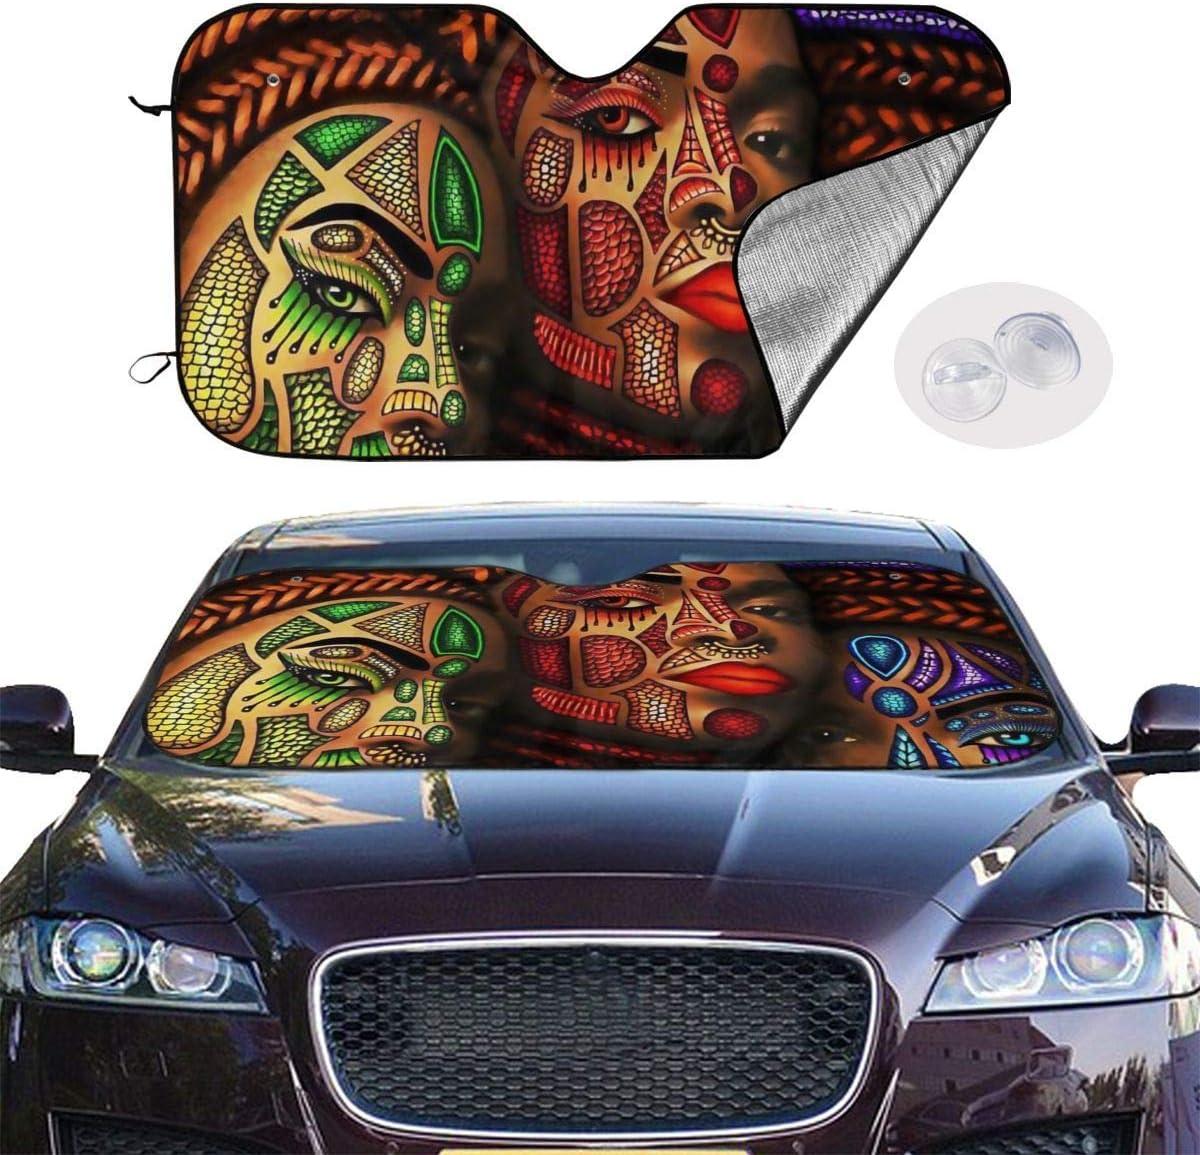 Kejbr African Art Sun Protection Car Frontscheibe Sun Shade Keep Your Vehicle Cool-UV Ray Protector Sunshad for Car Auto Sedan Truck SUV